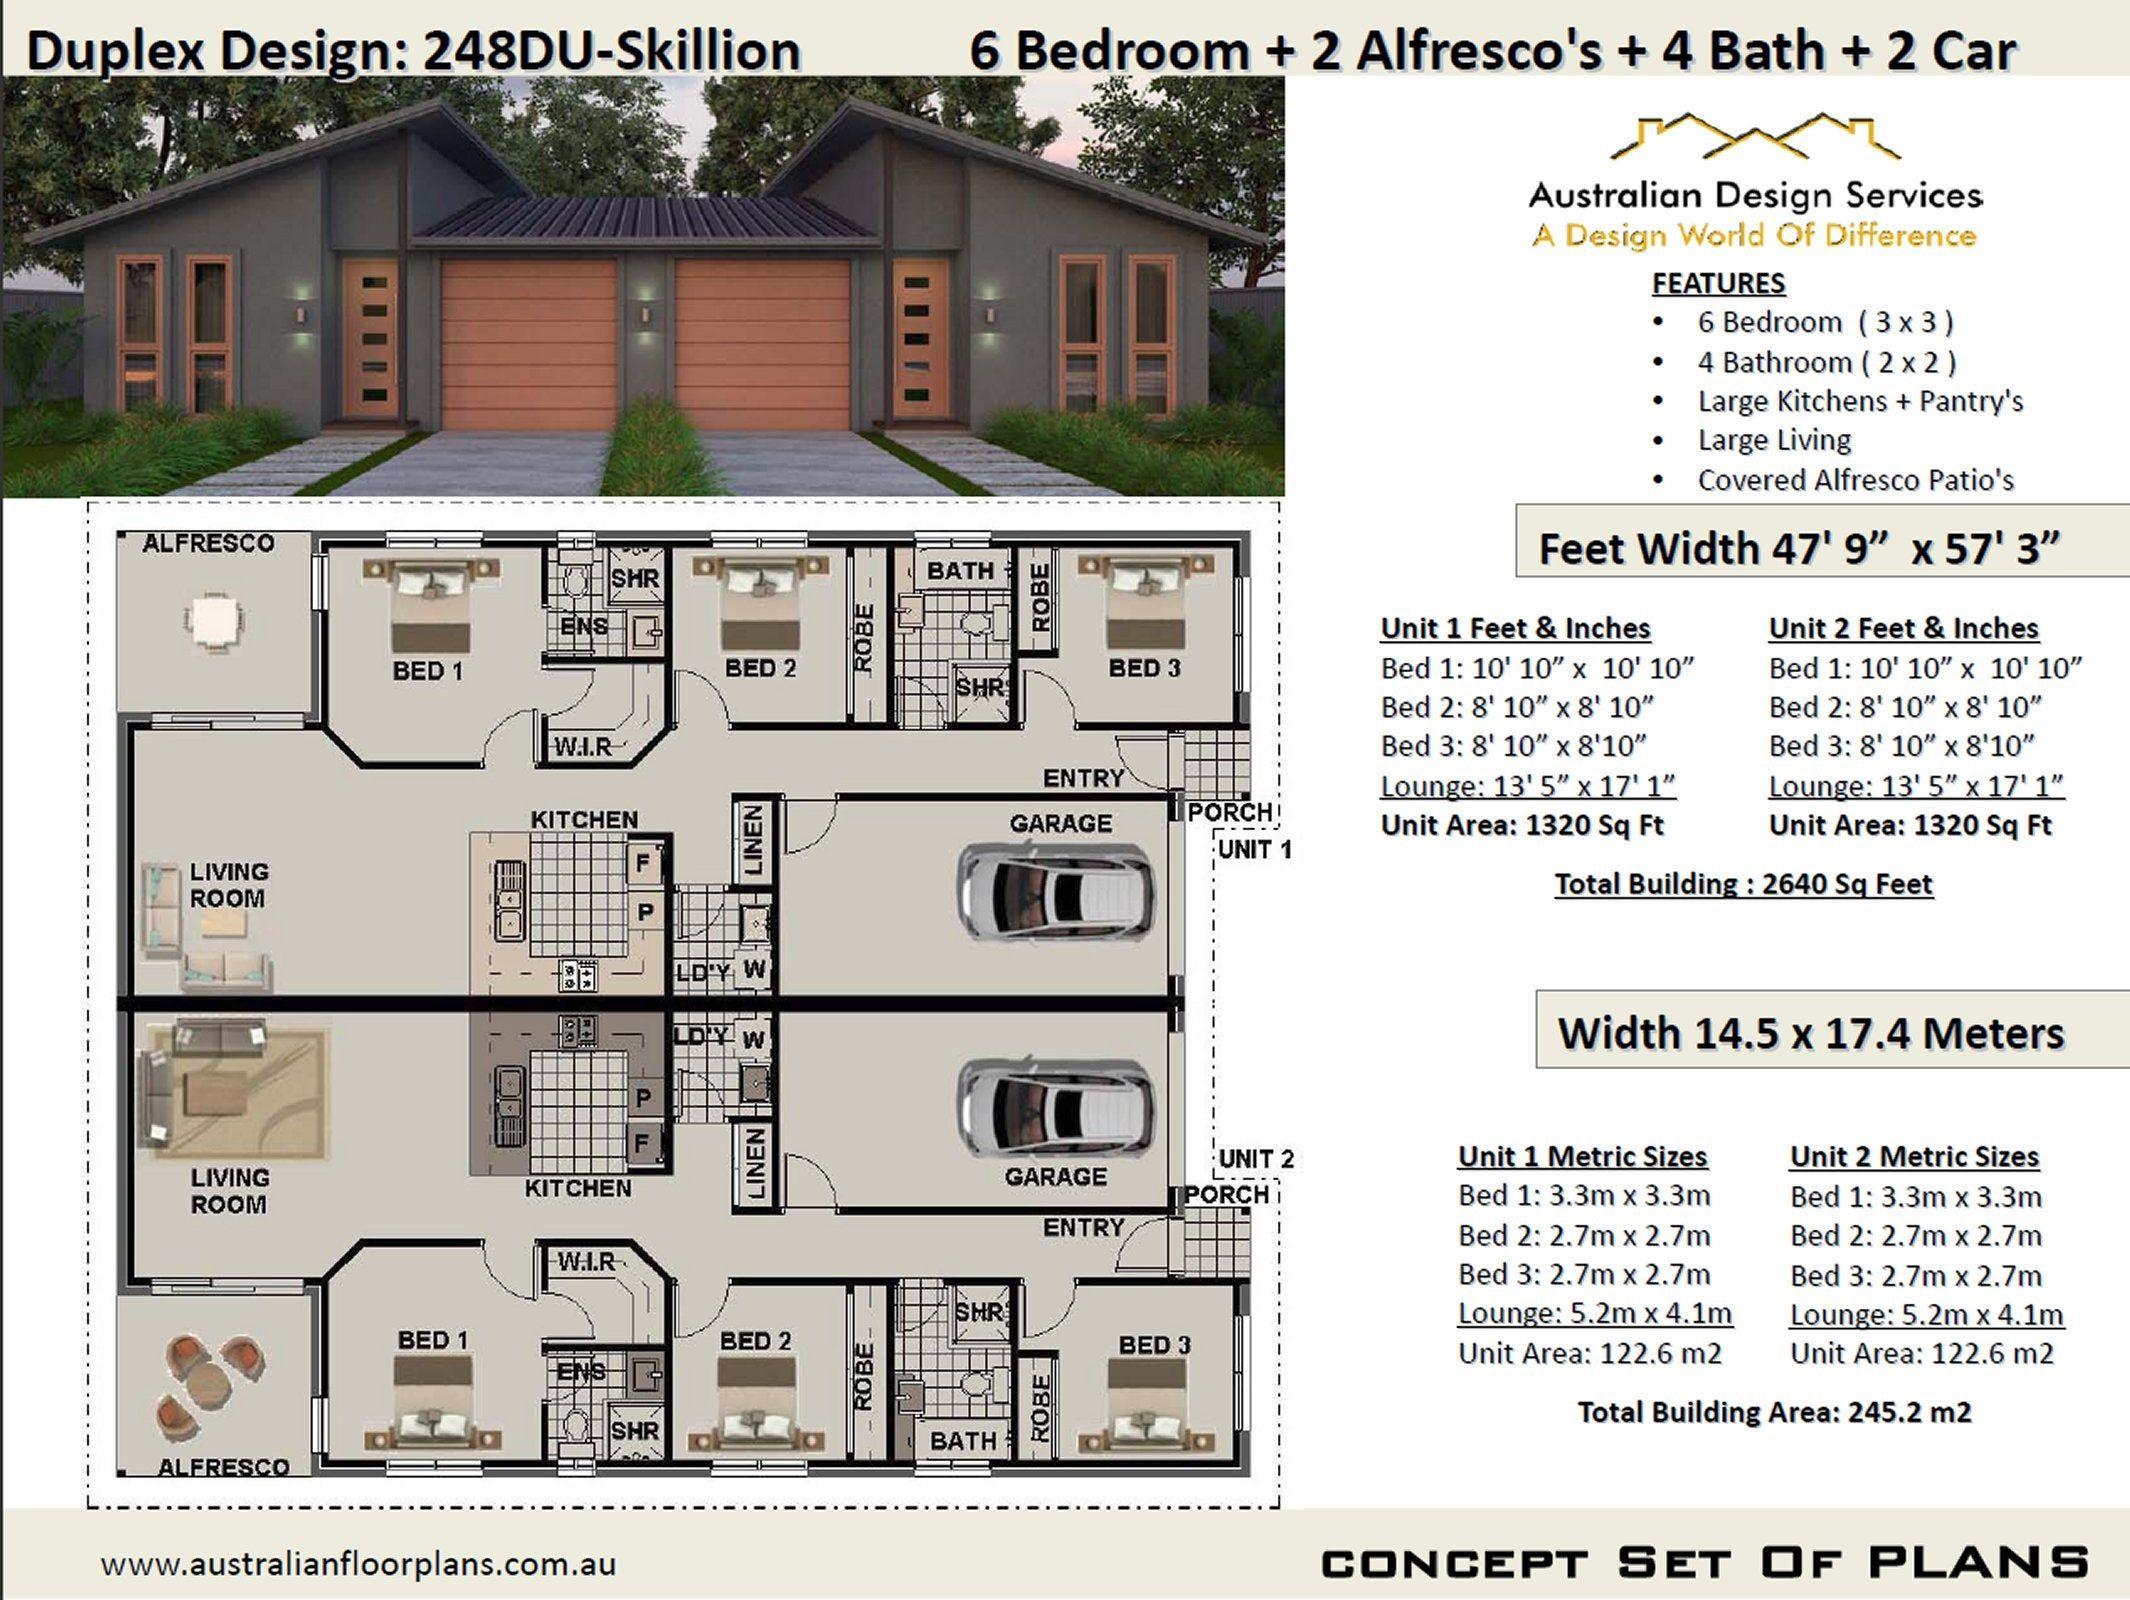 6 Bedroom Duplex House Plans 6 Bedroom Duplex House Design 6 Bedroom House Plans 2 Story Series 1 Dubai Khalifa